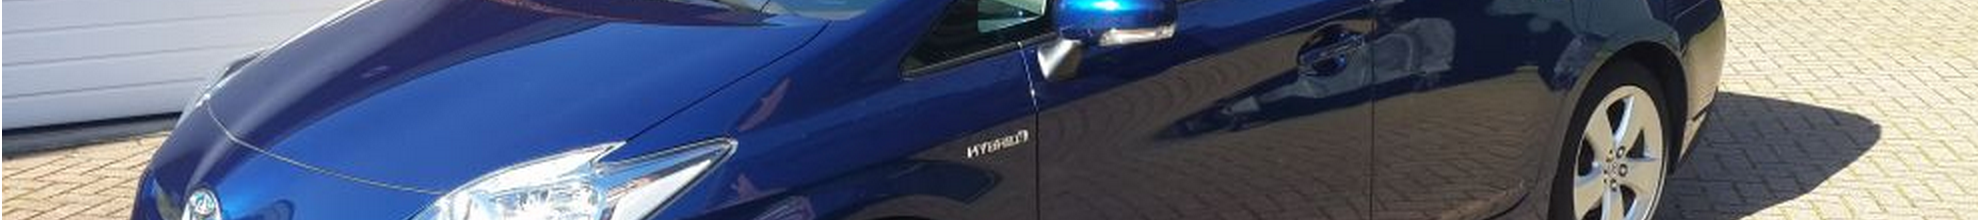 Toyota gebruikte hybride